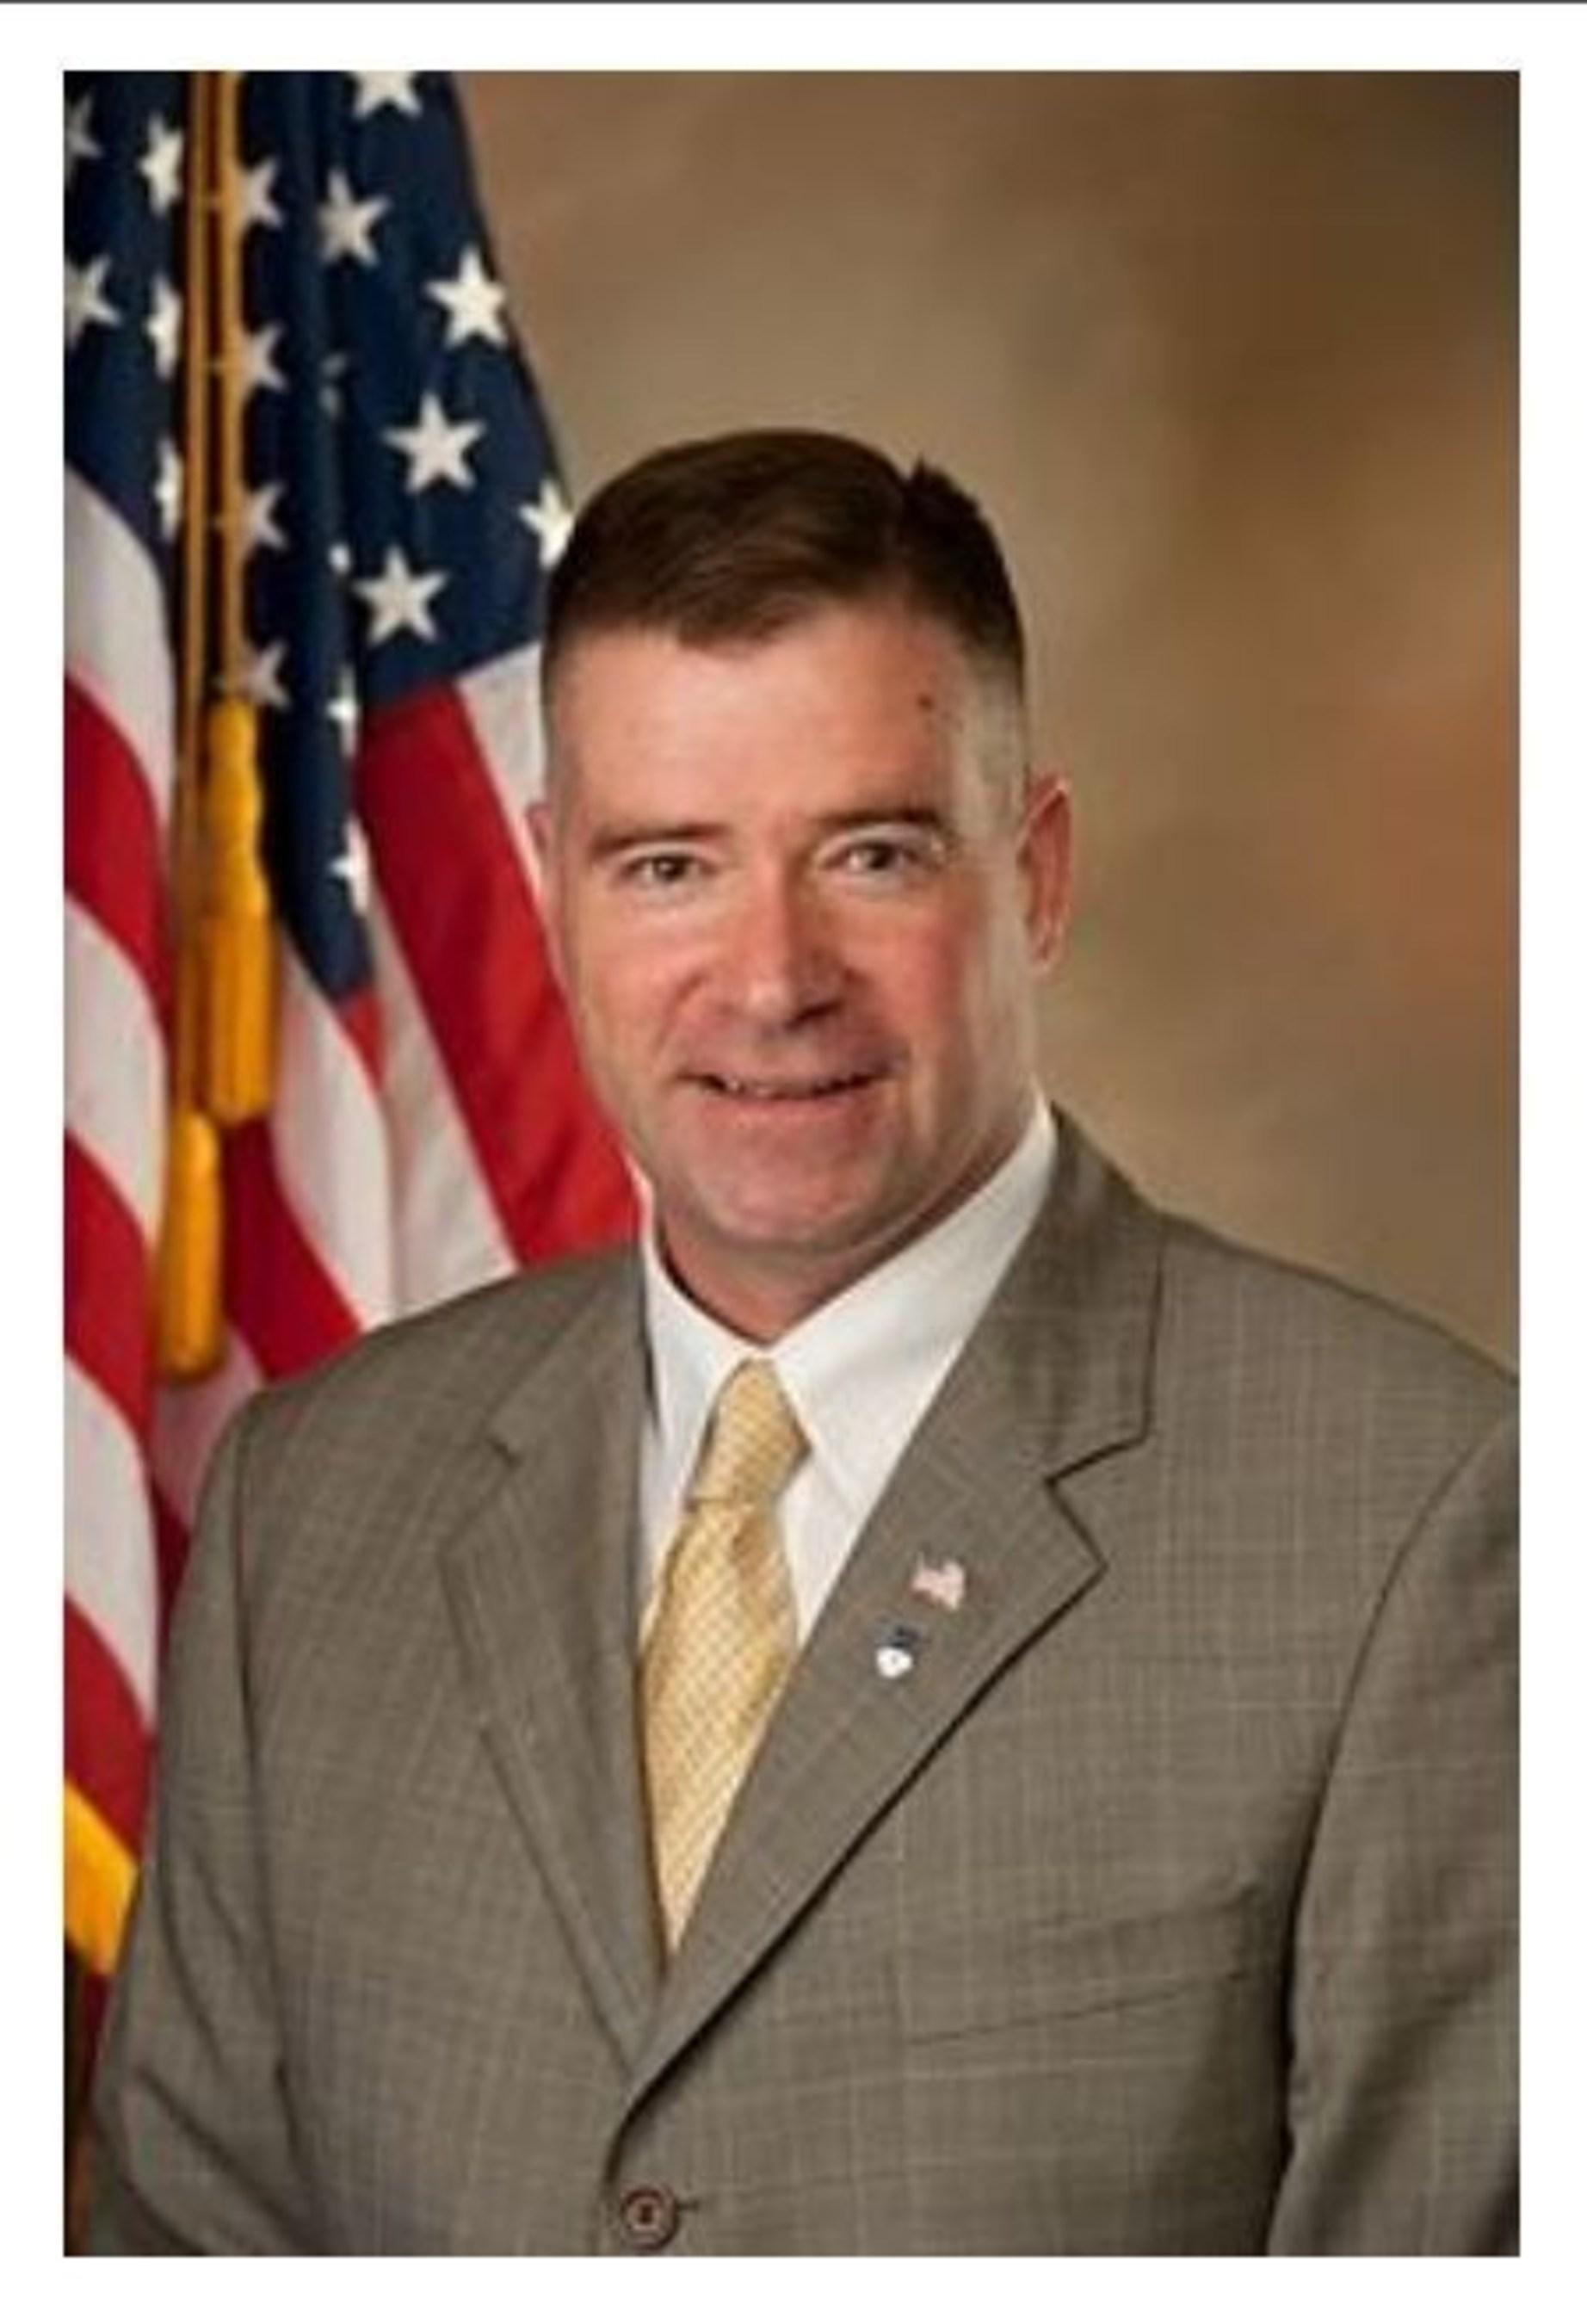 U.S. Congressman, Chris Gibson (R-NY) Joins Springbrook's Board of Directors